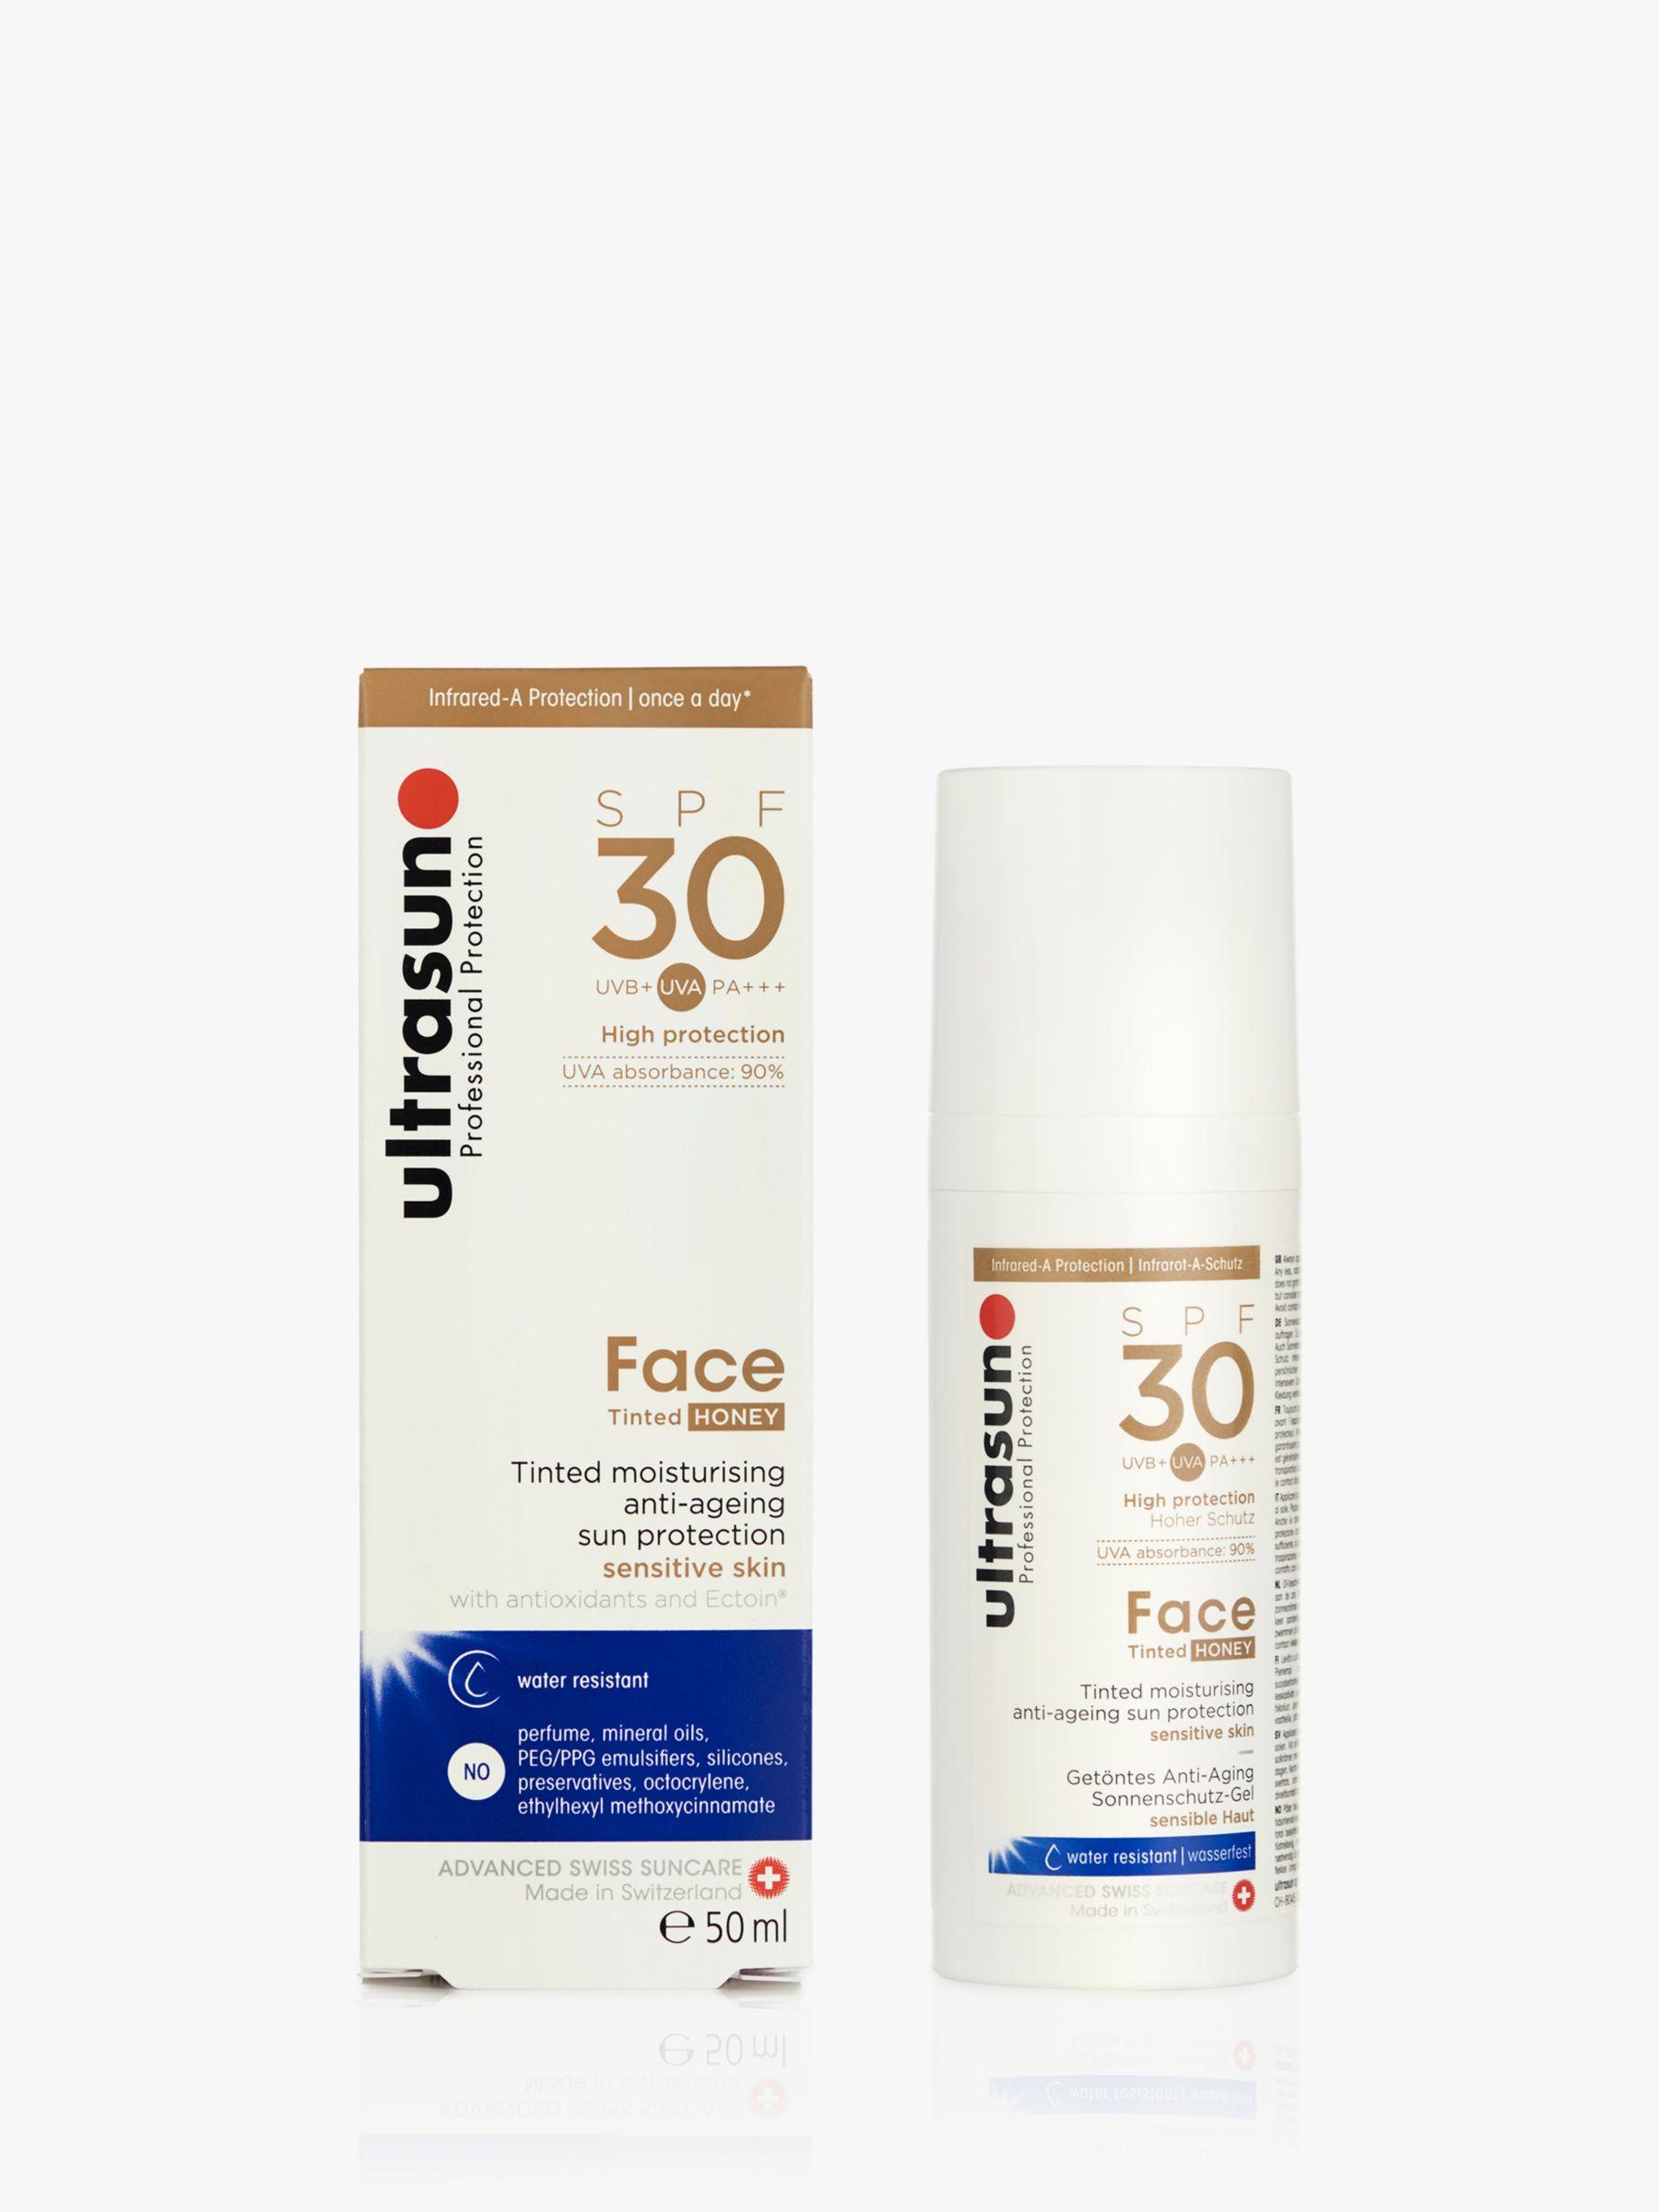 Ultrasun Ultrasun SPF 30 Tinted Face Sun Cream, 50ml